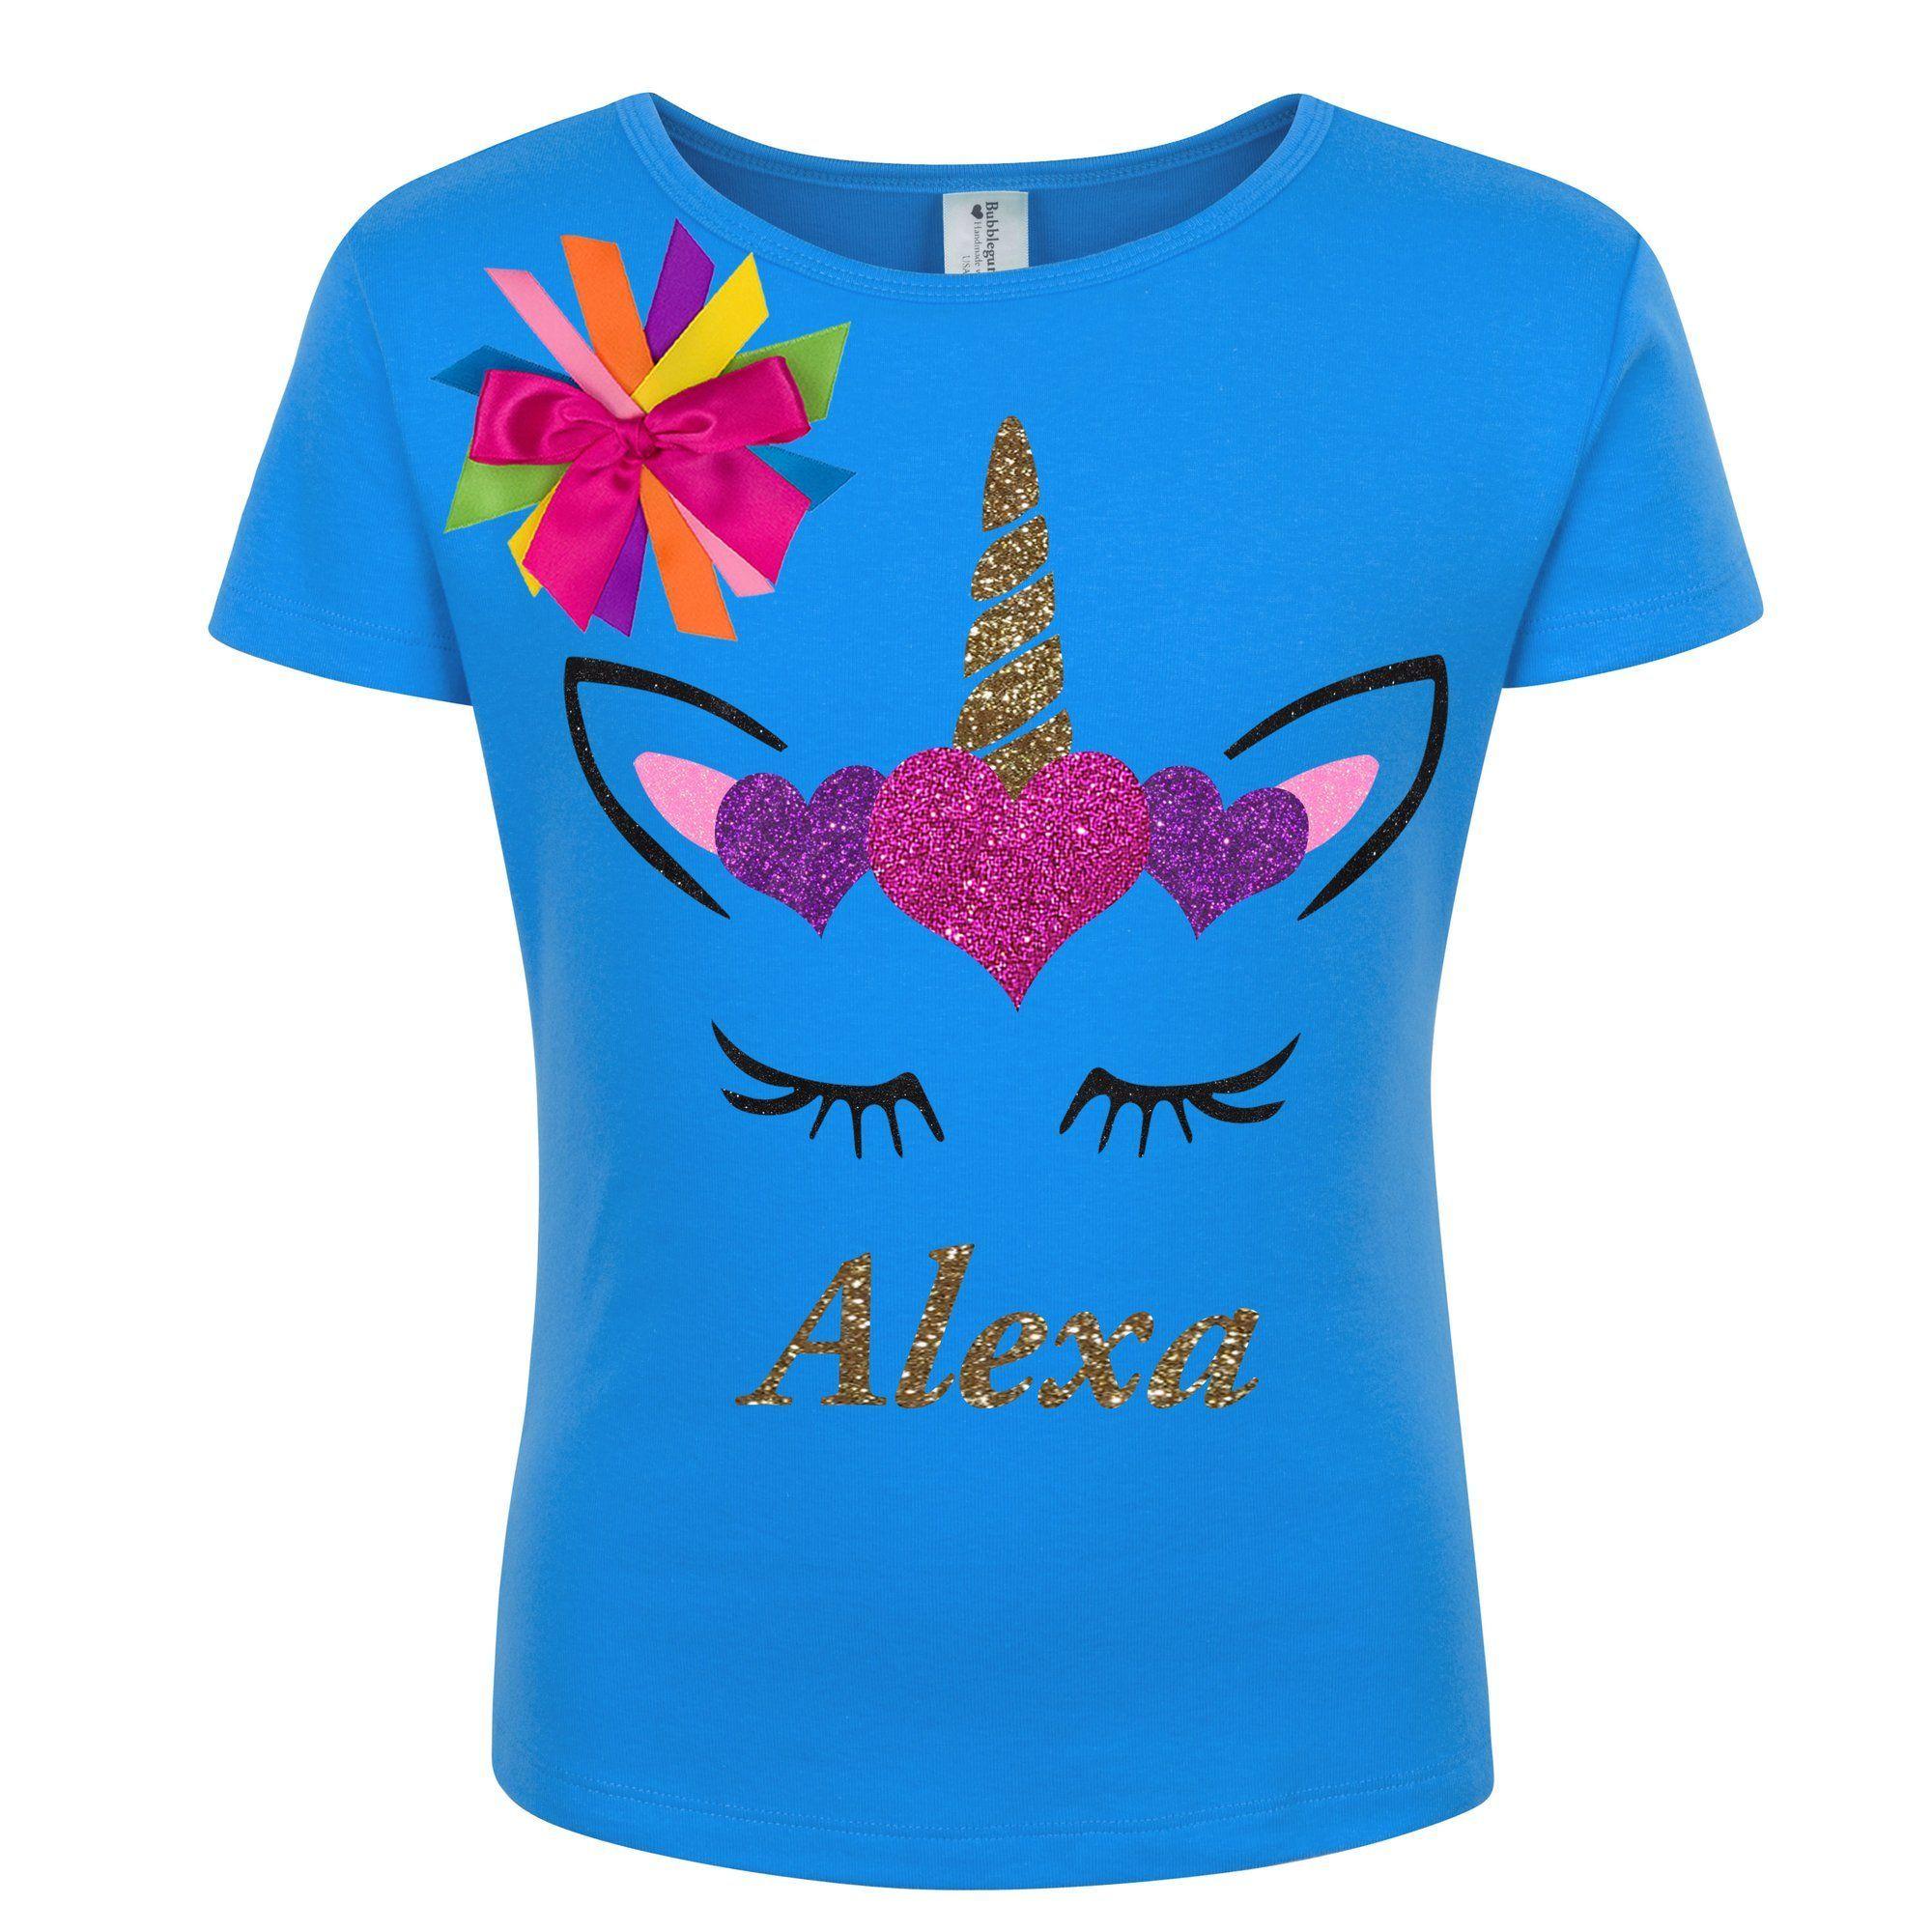 Bubblegum Divas Unicorn Shirt Girls 2nd Birthday Rainbow Party Personalized Gift